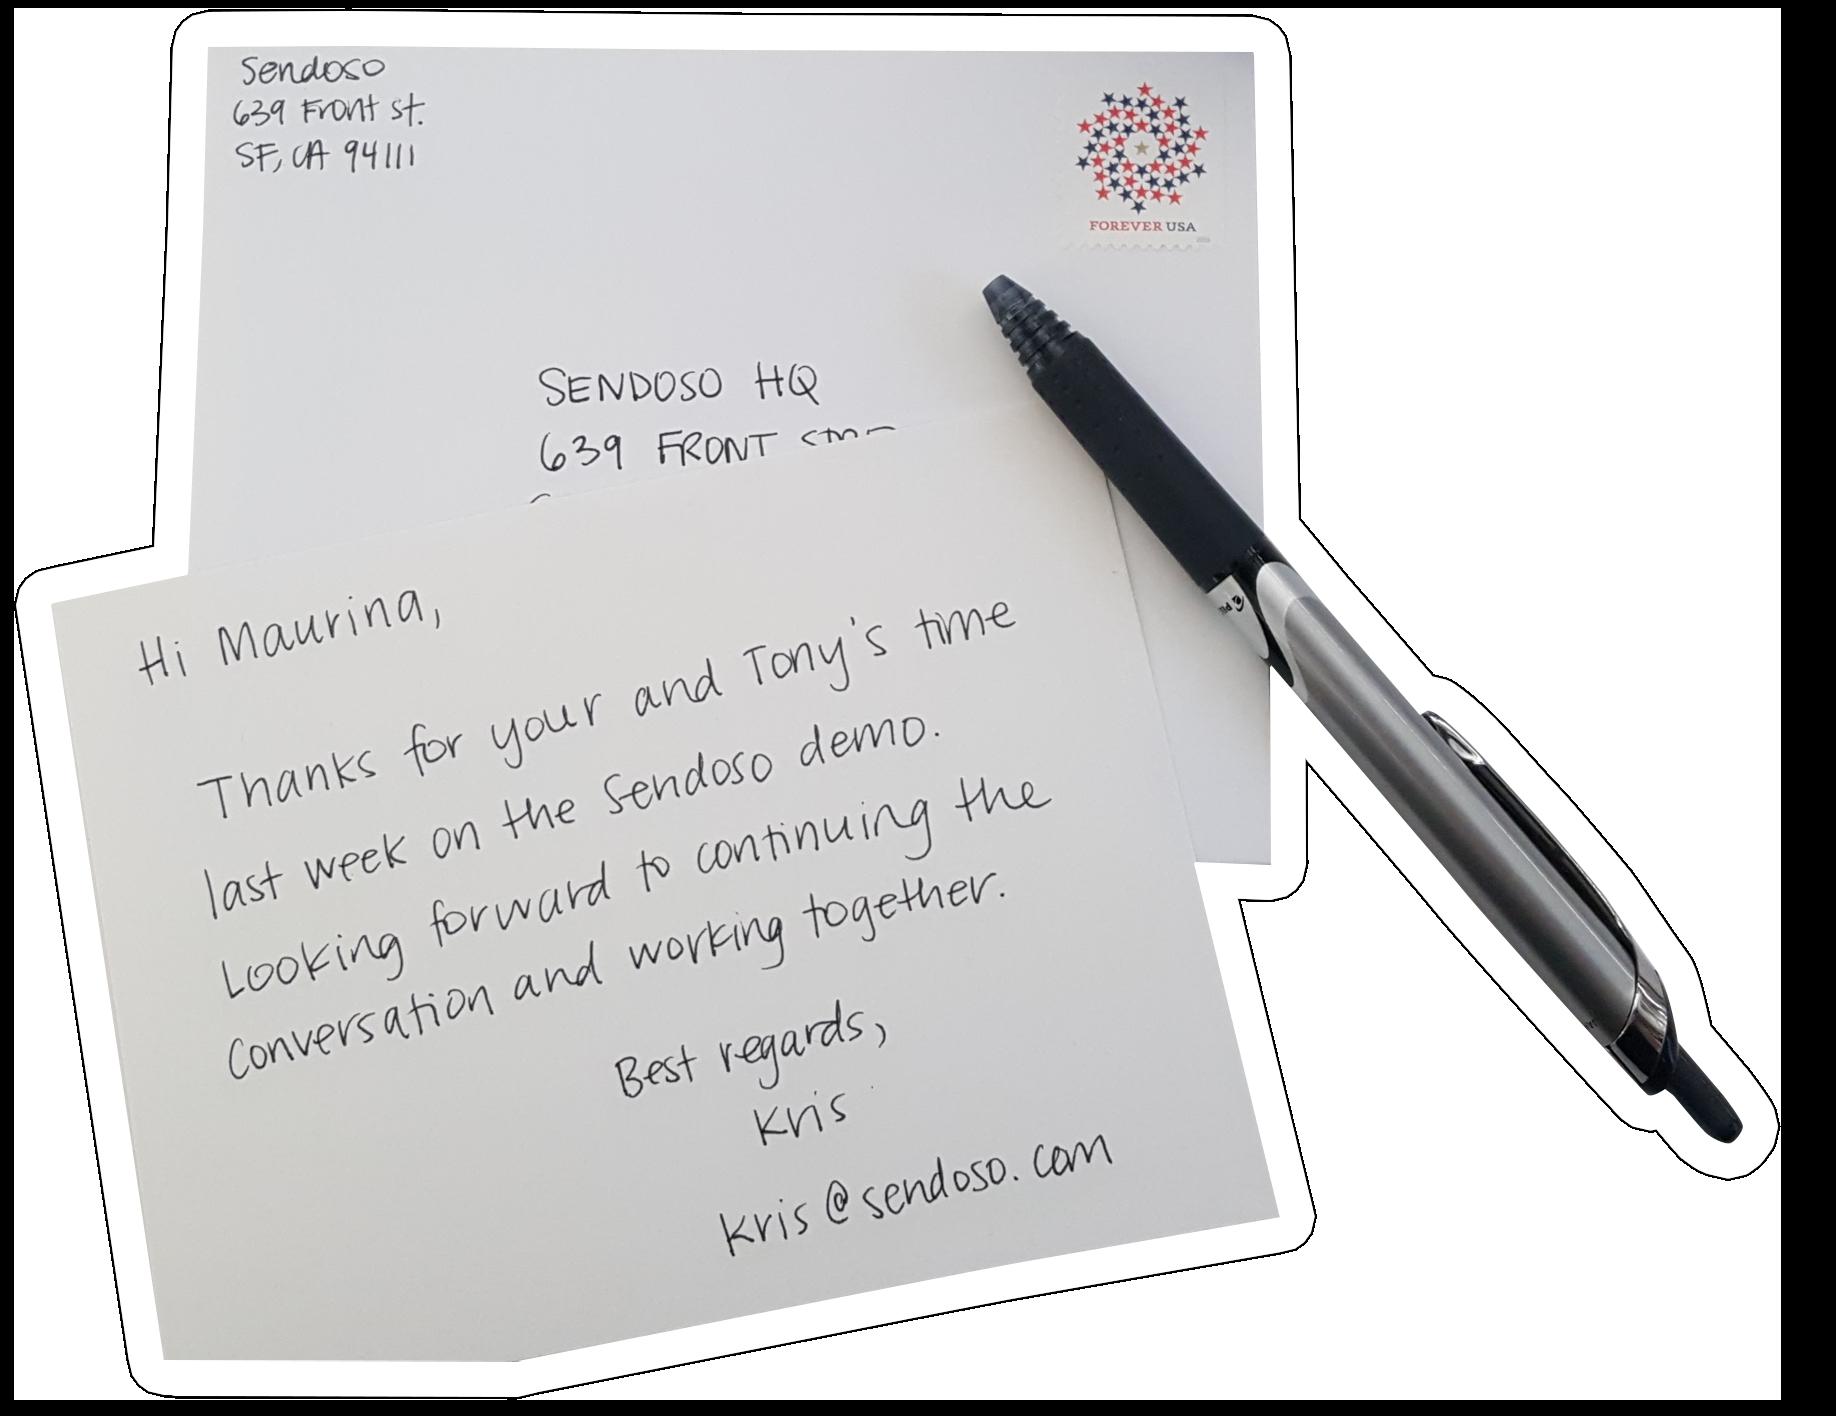 example-handwritten-note-1.png#asset:4980